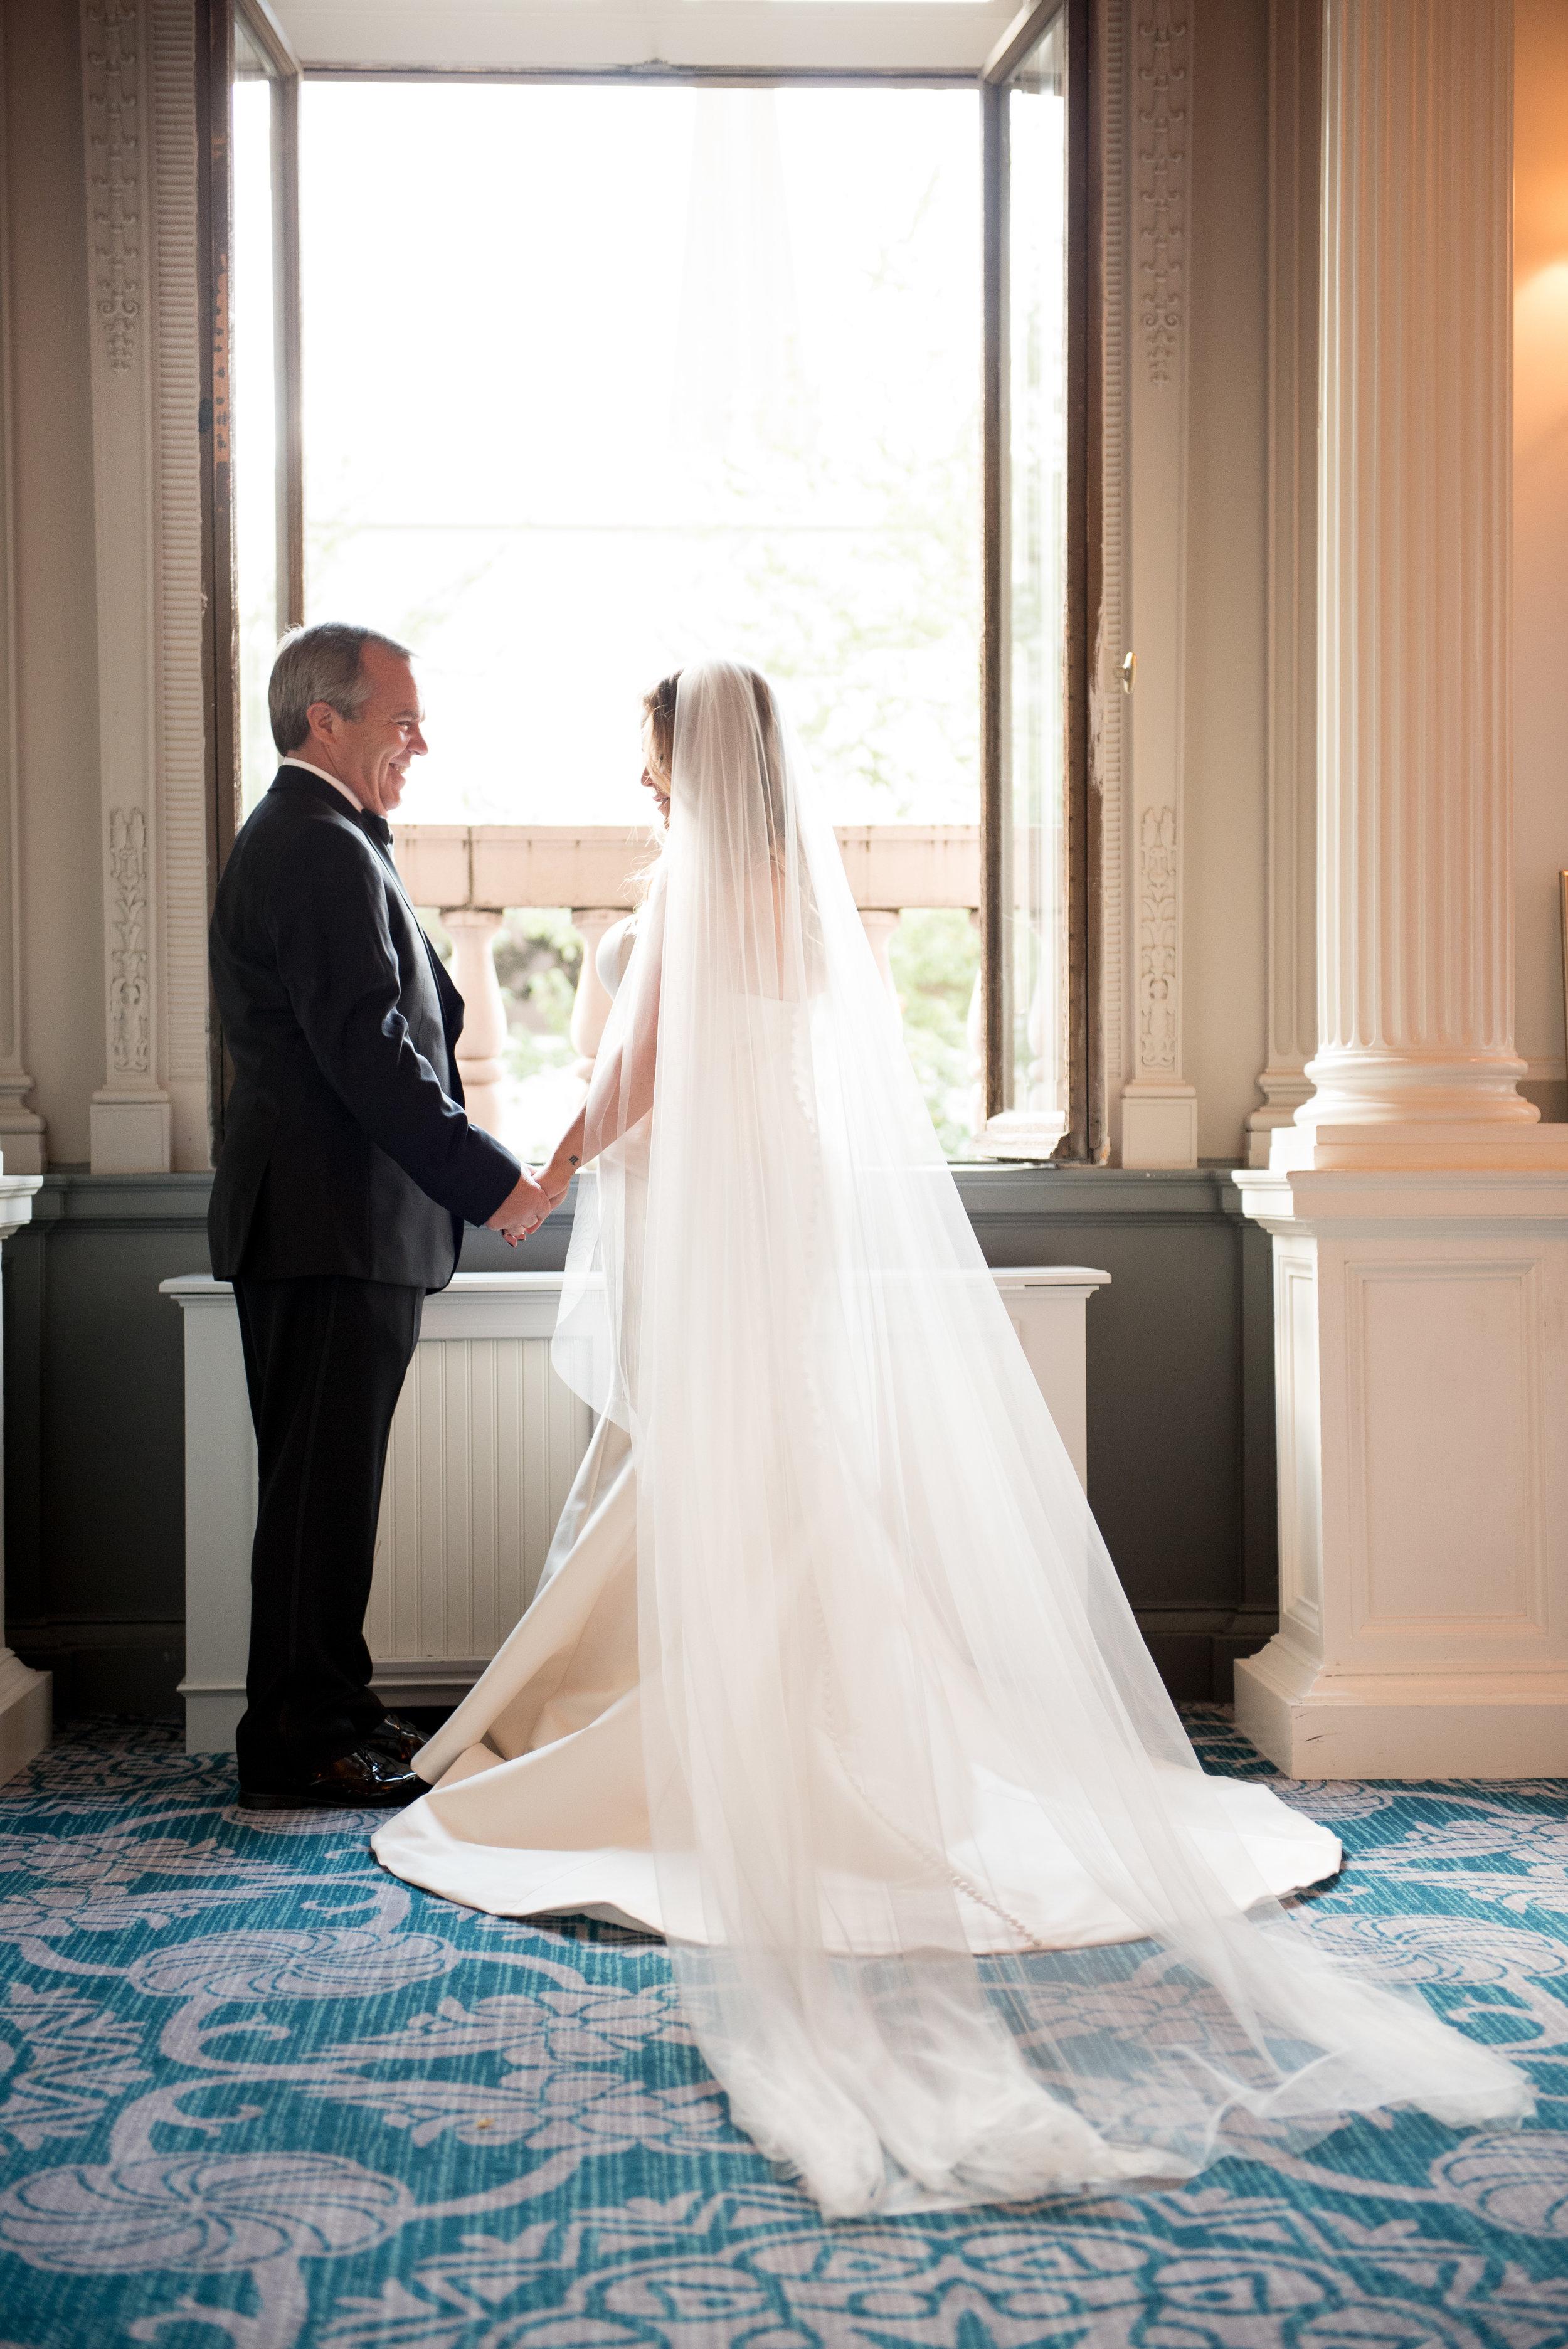 Jennifer Alyse Weddings - Breanne & Robby017.jpg